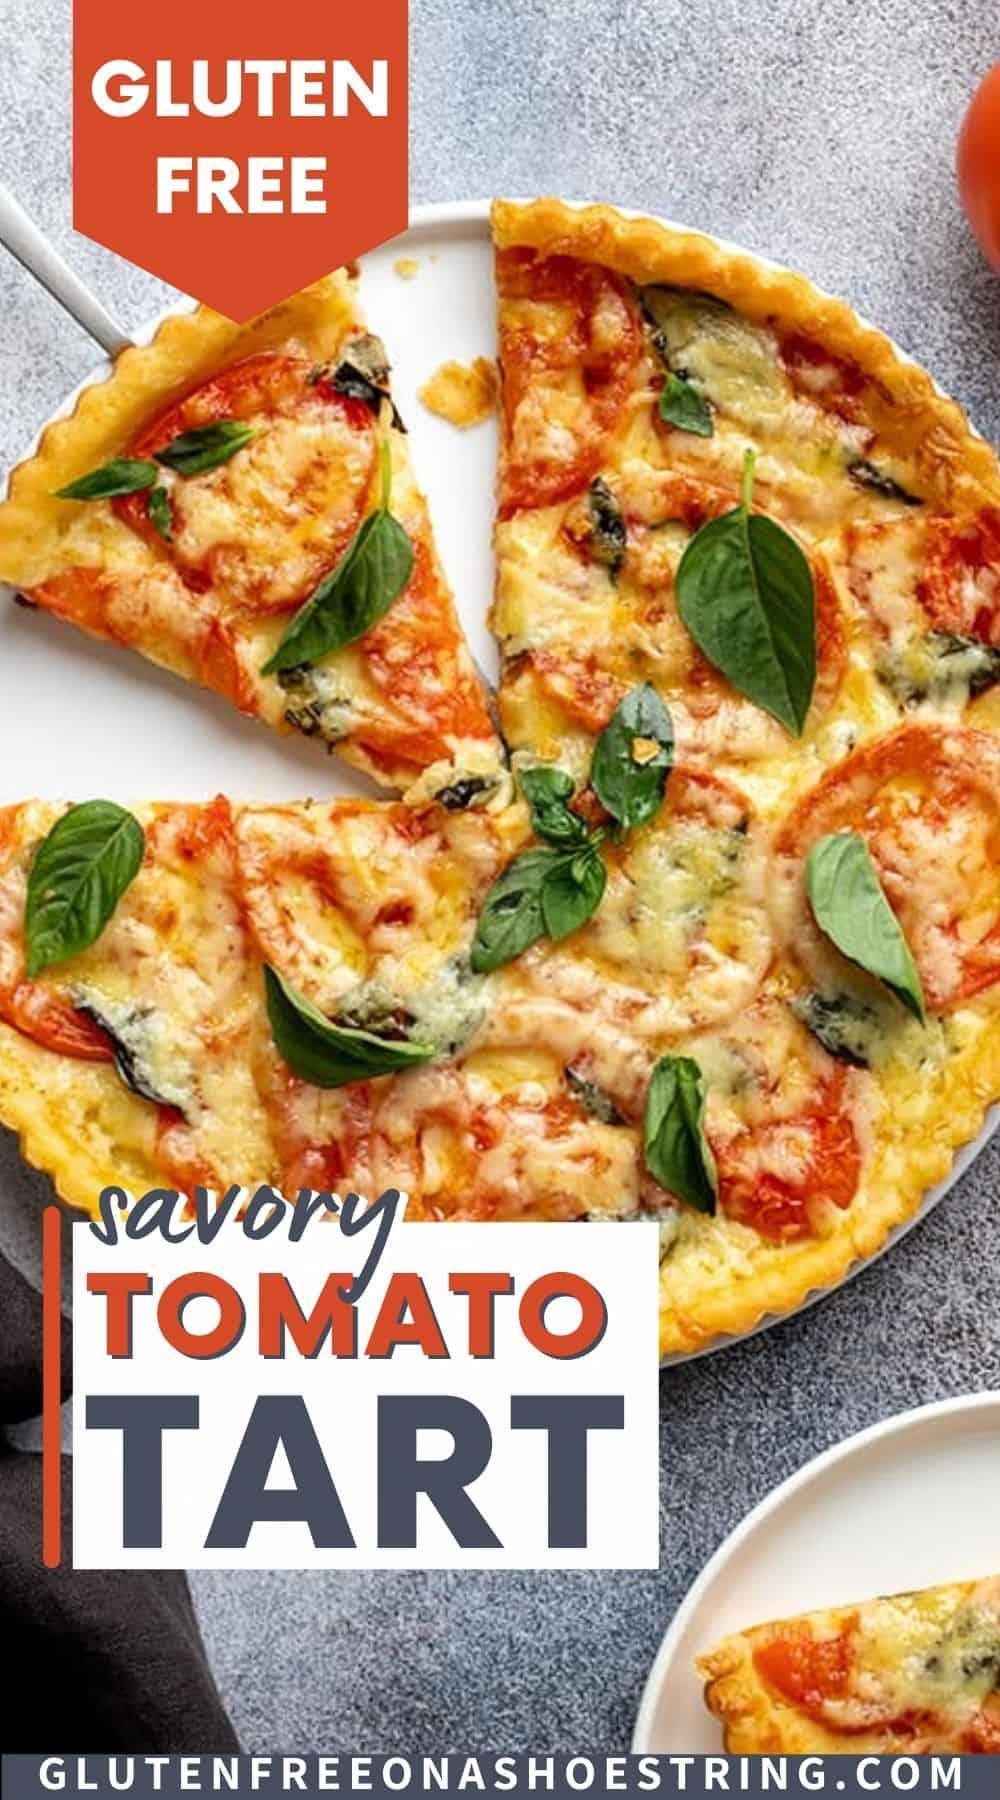 Words gluten free savory tomato tart on image of tomato tart on white serving dish partially sliced